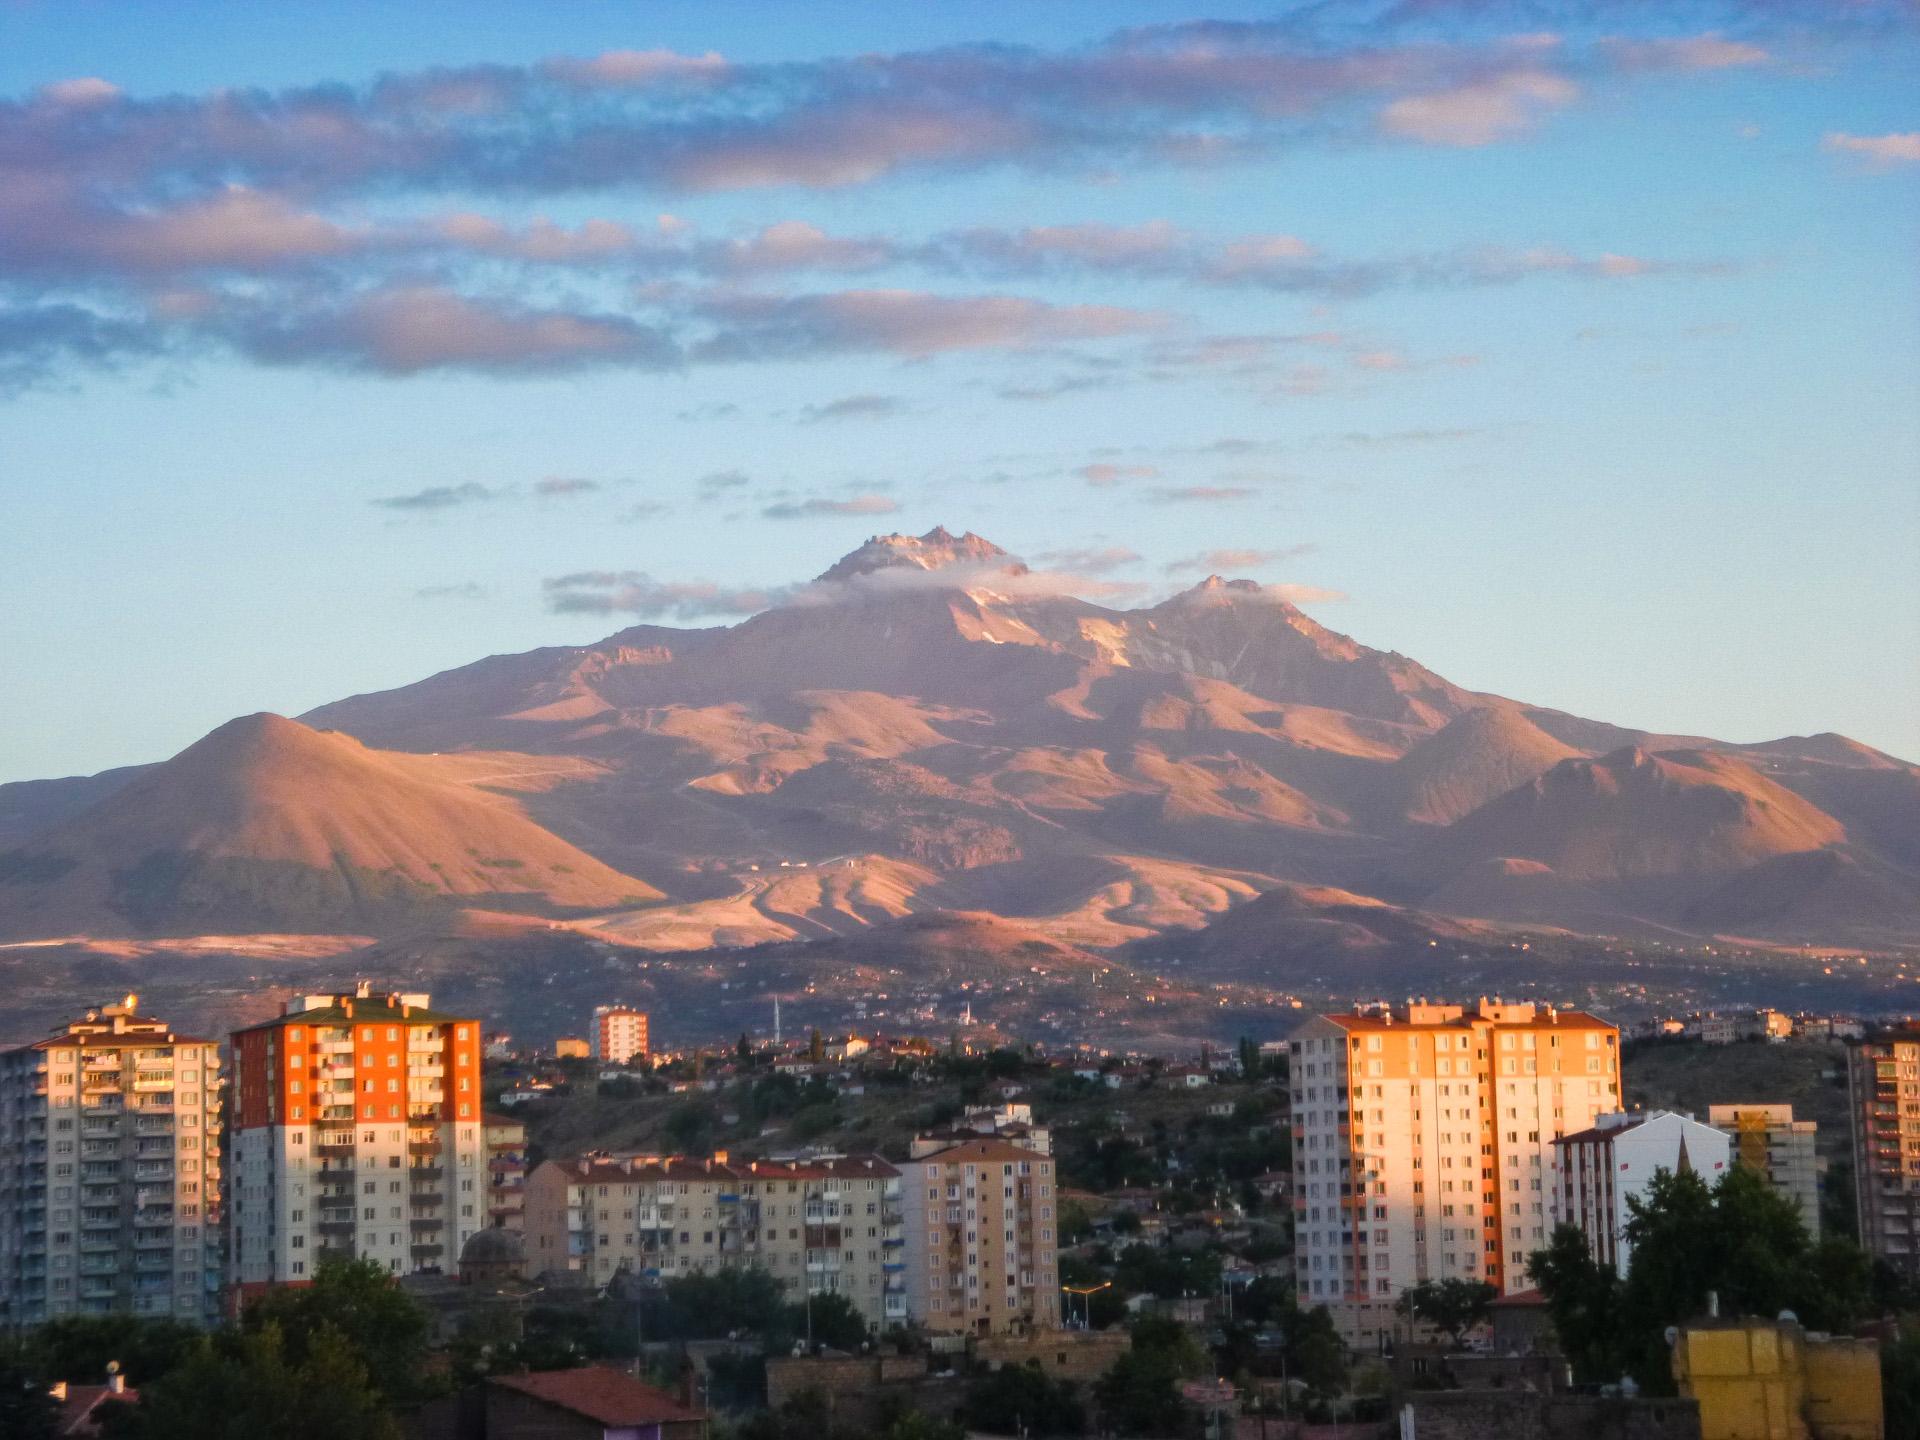 Wulkan Erciyes 3918 m n.p.m., Kayseri, Turcja